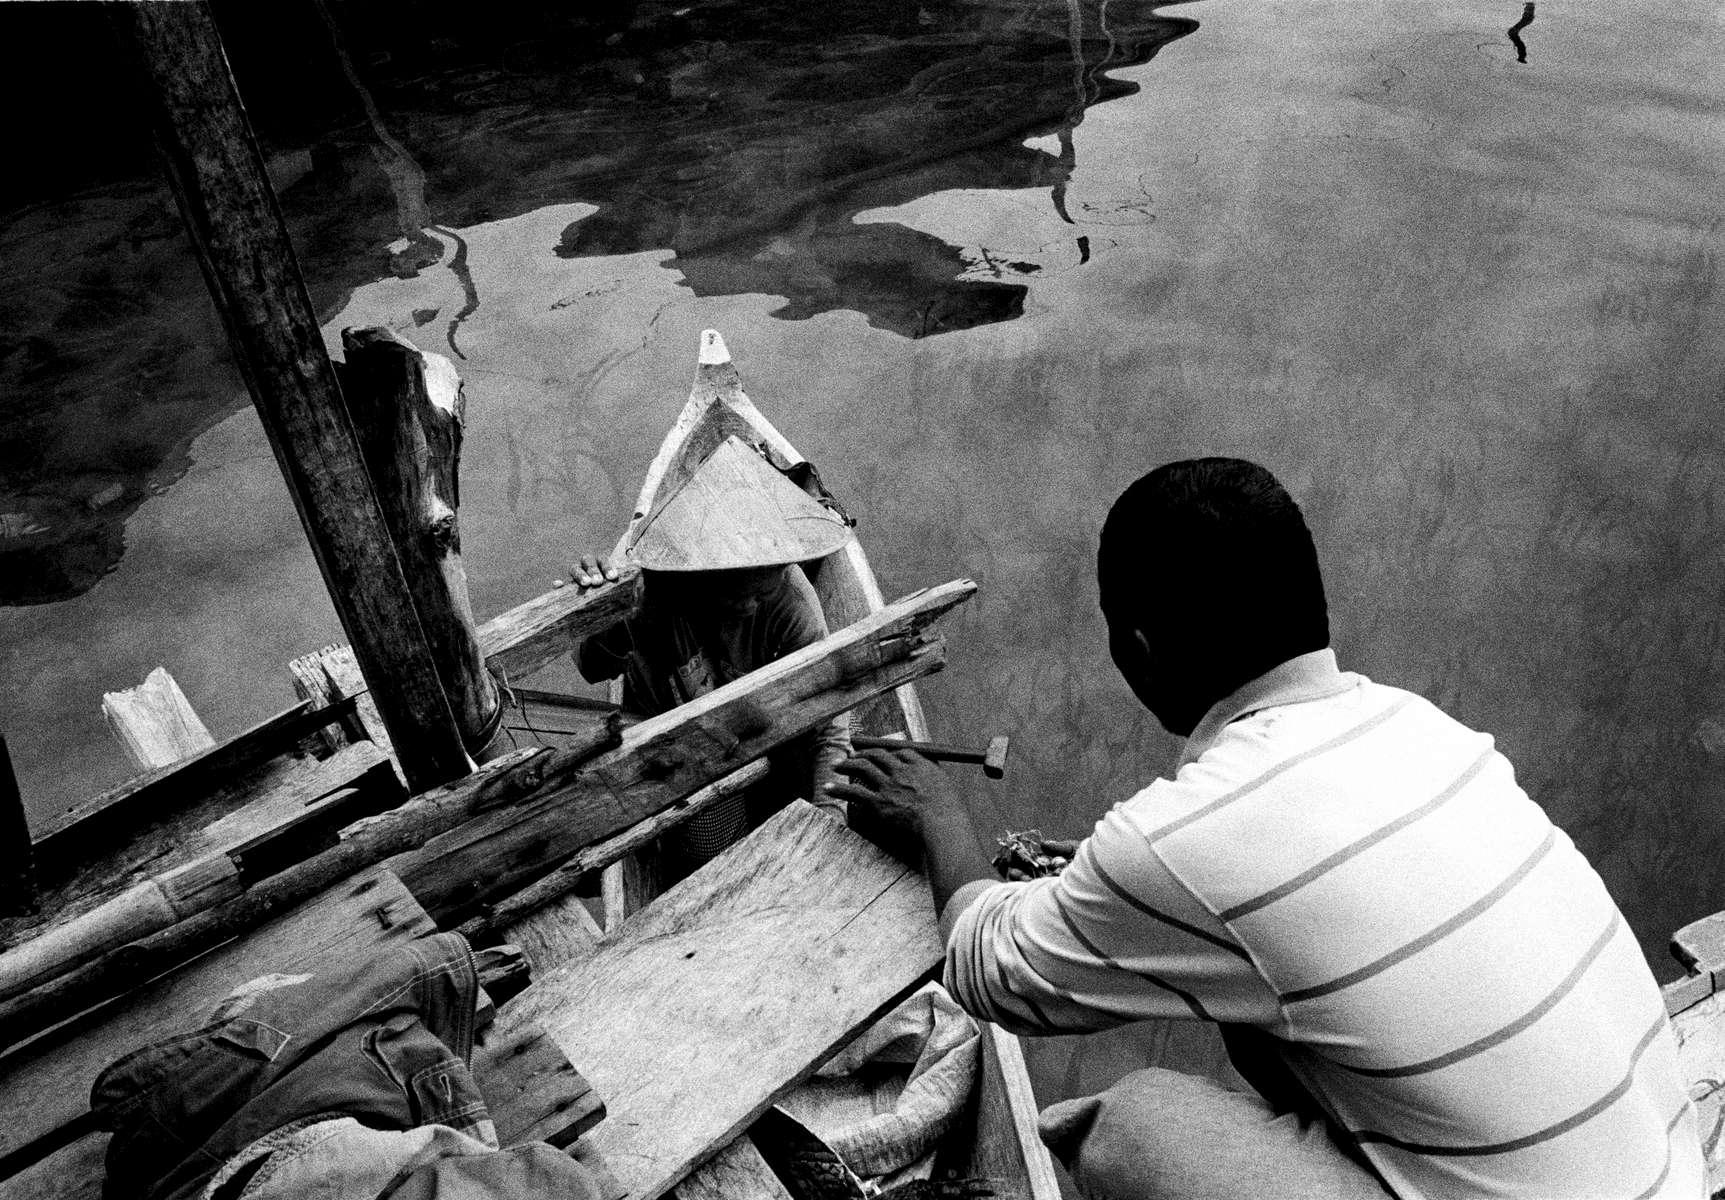 Bajo sea gypsy village, Torosiaje, Suluwesi, Indonesia 2003